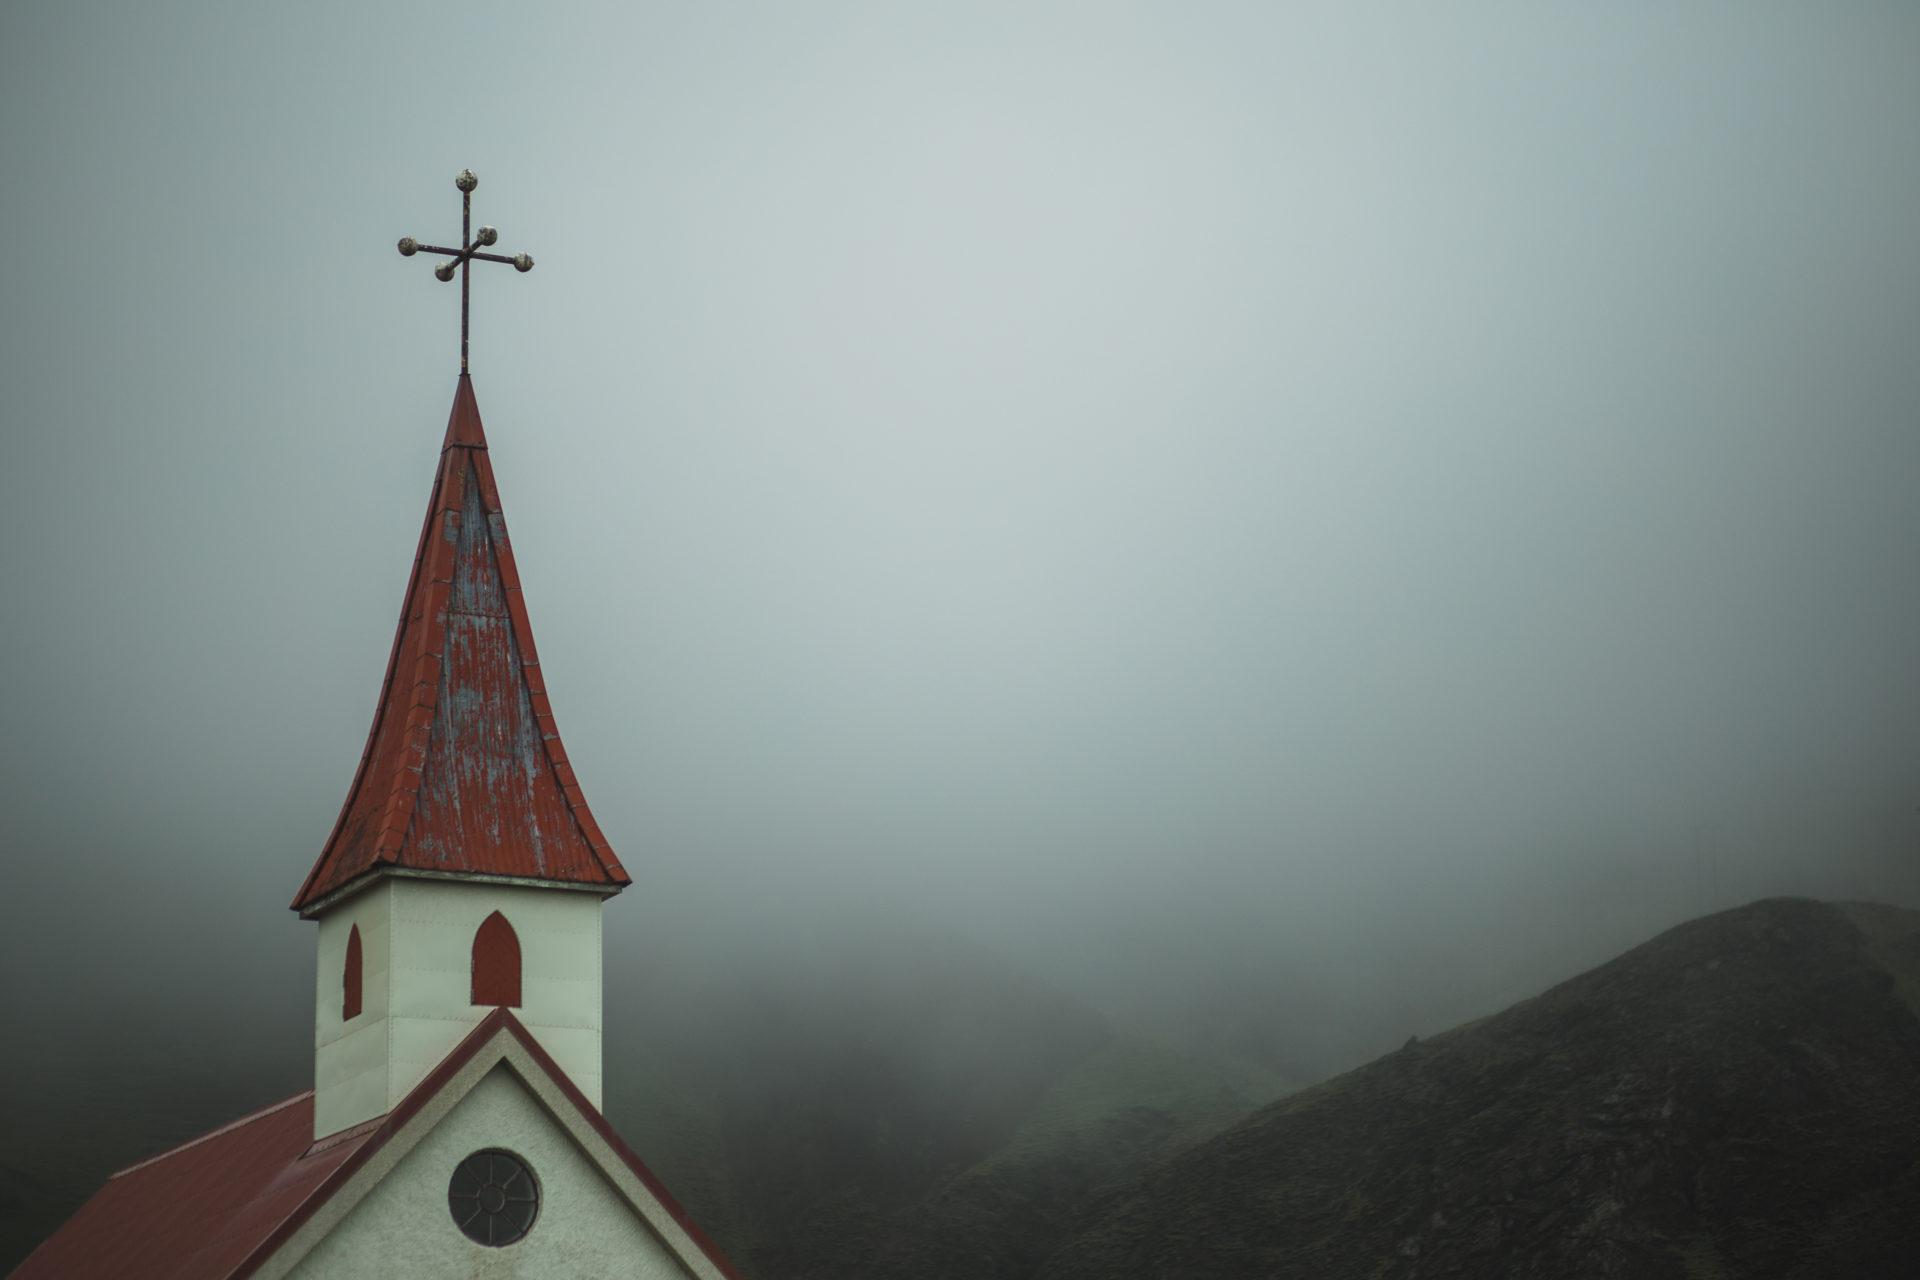 Island_Iceland_IMG_2458-2_Carolin-Weinkopf